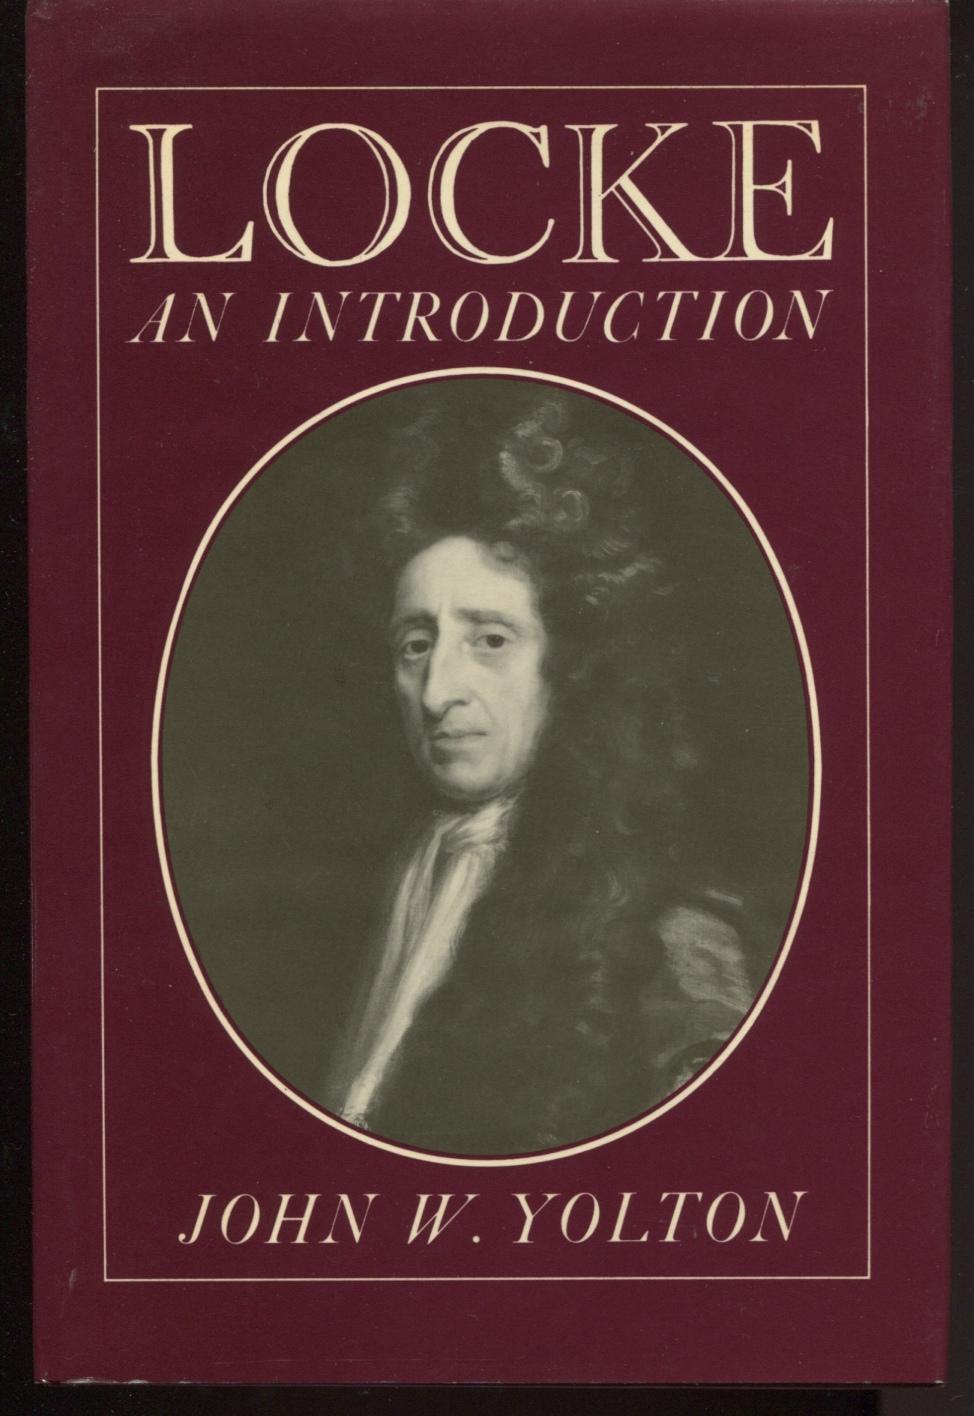 Locke An Introduction.